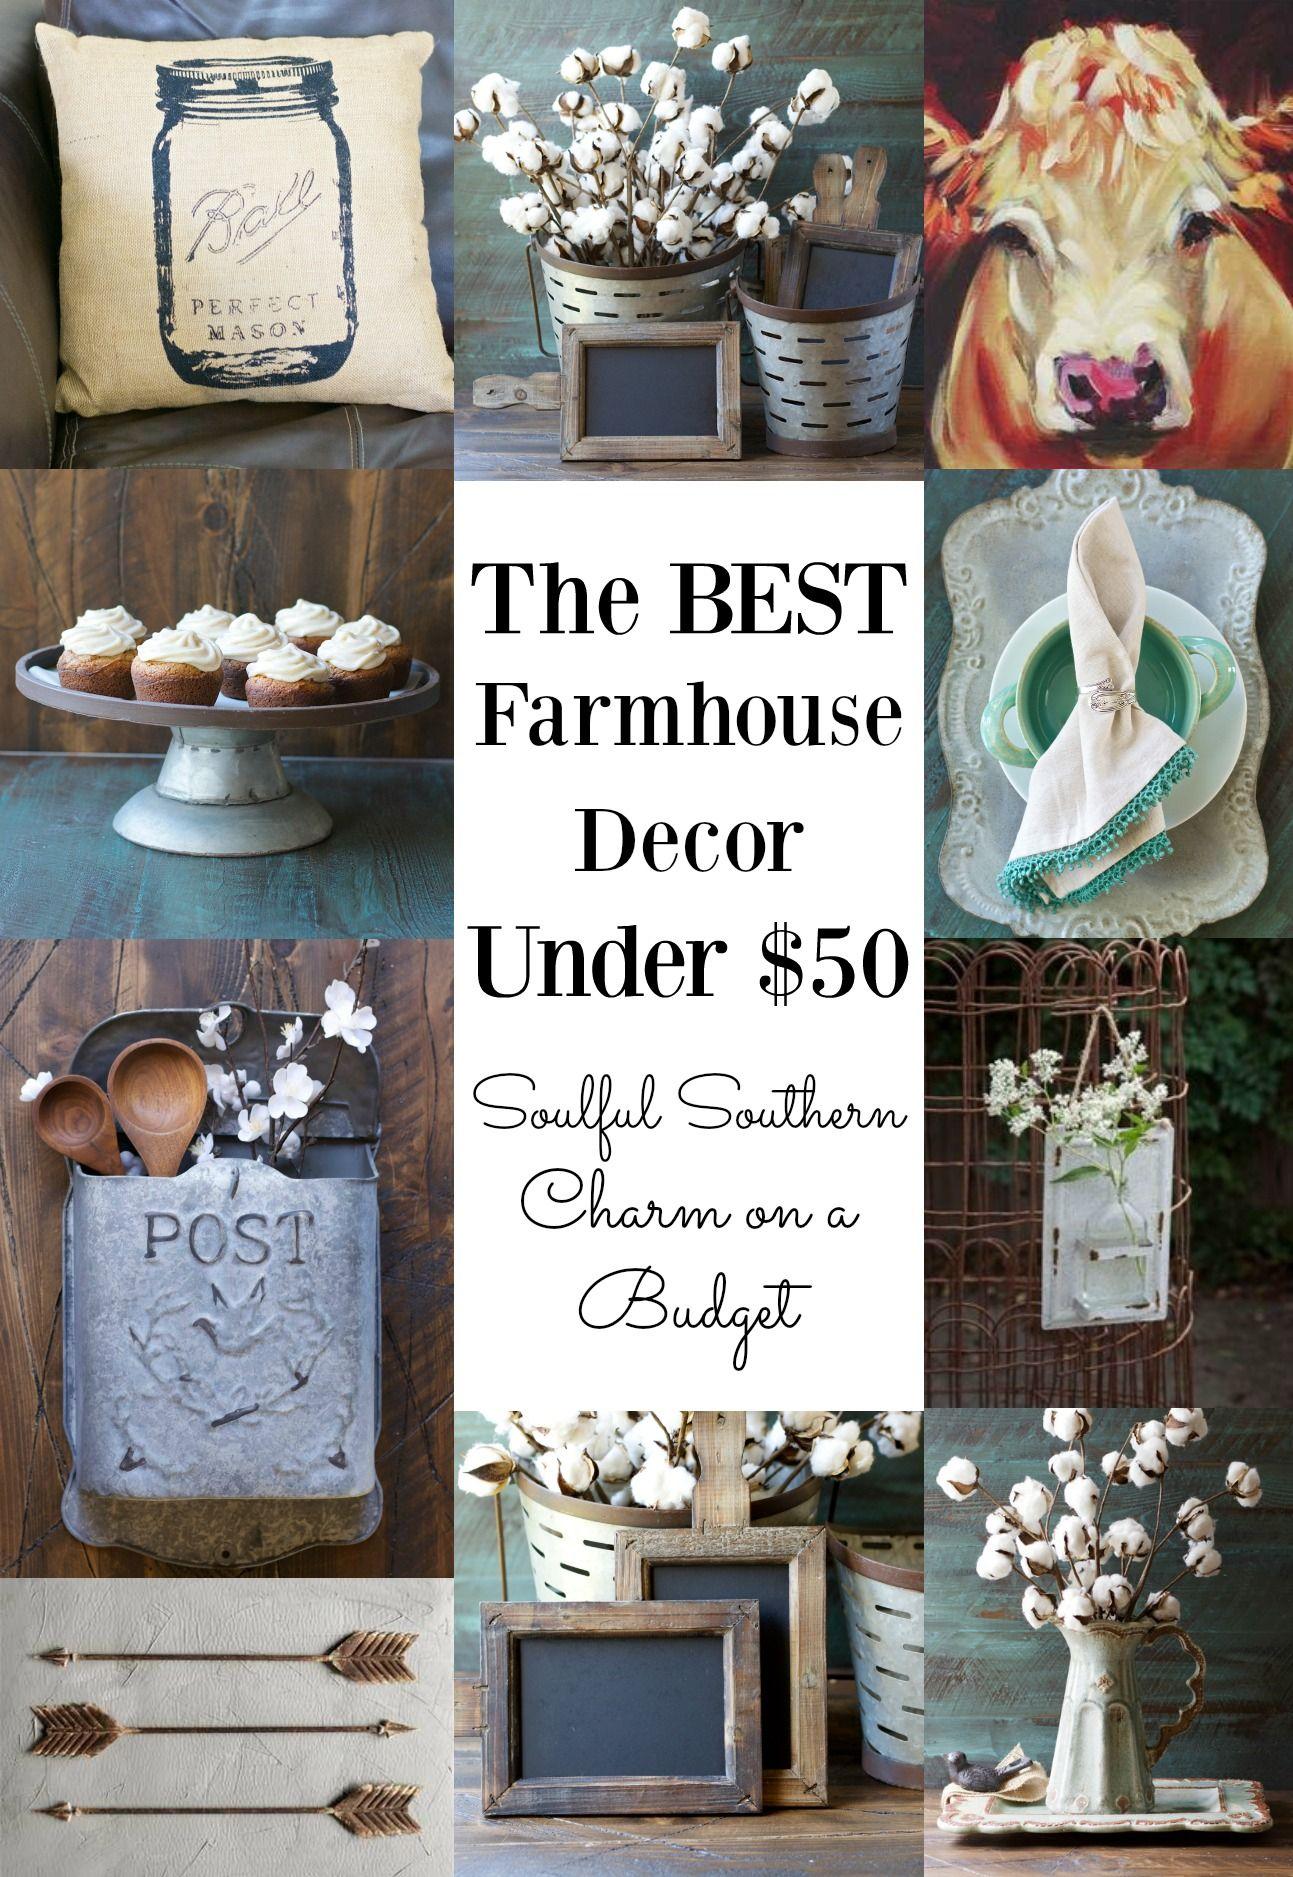 The Best Farmhouse Decor under $50! I love this vintage ...